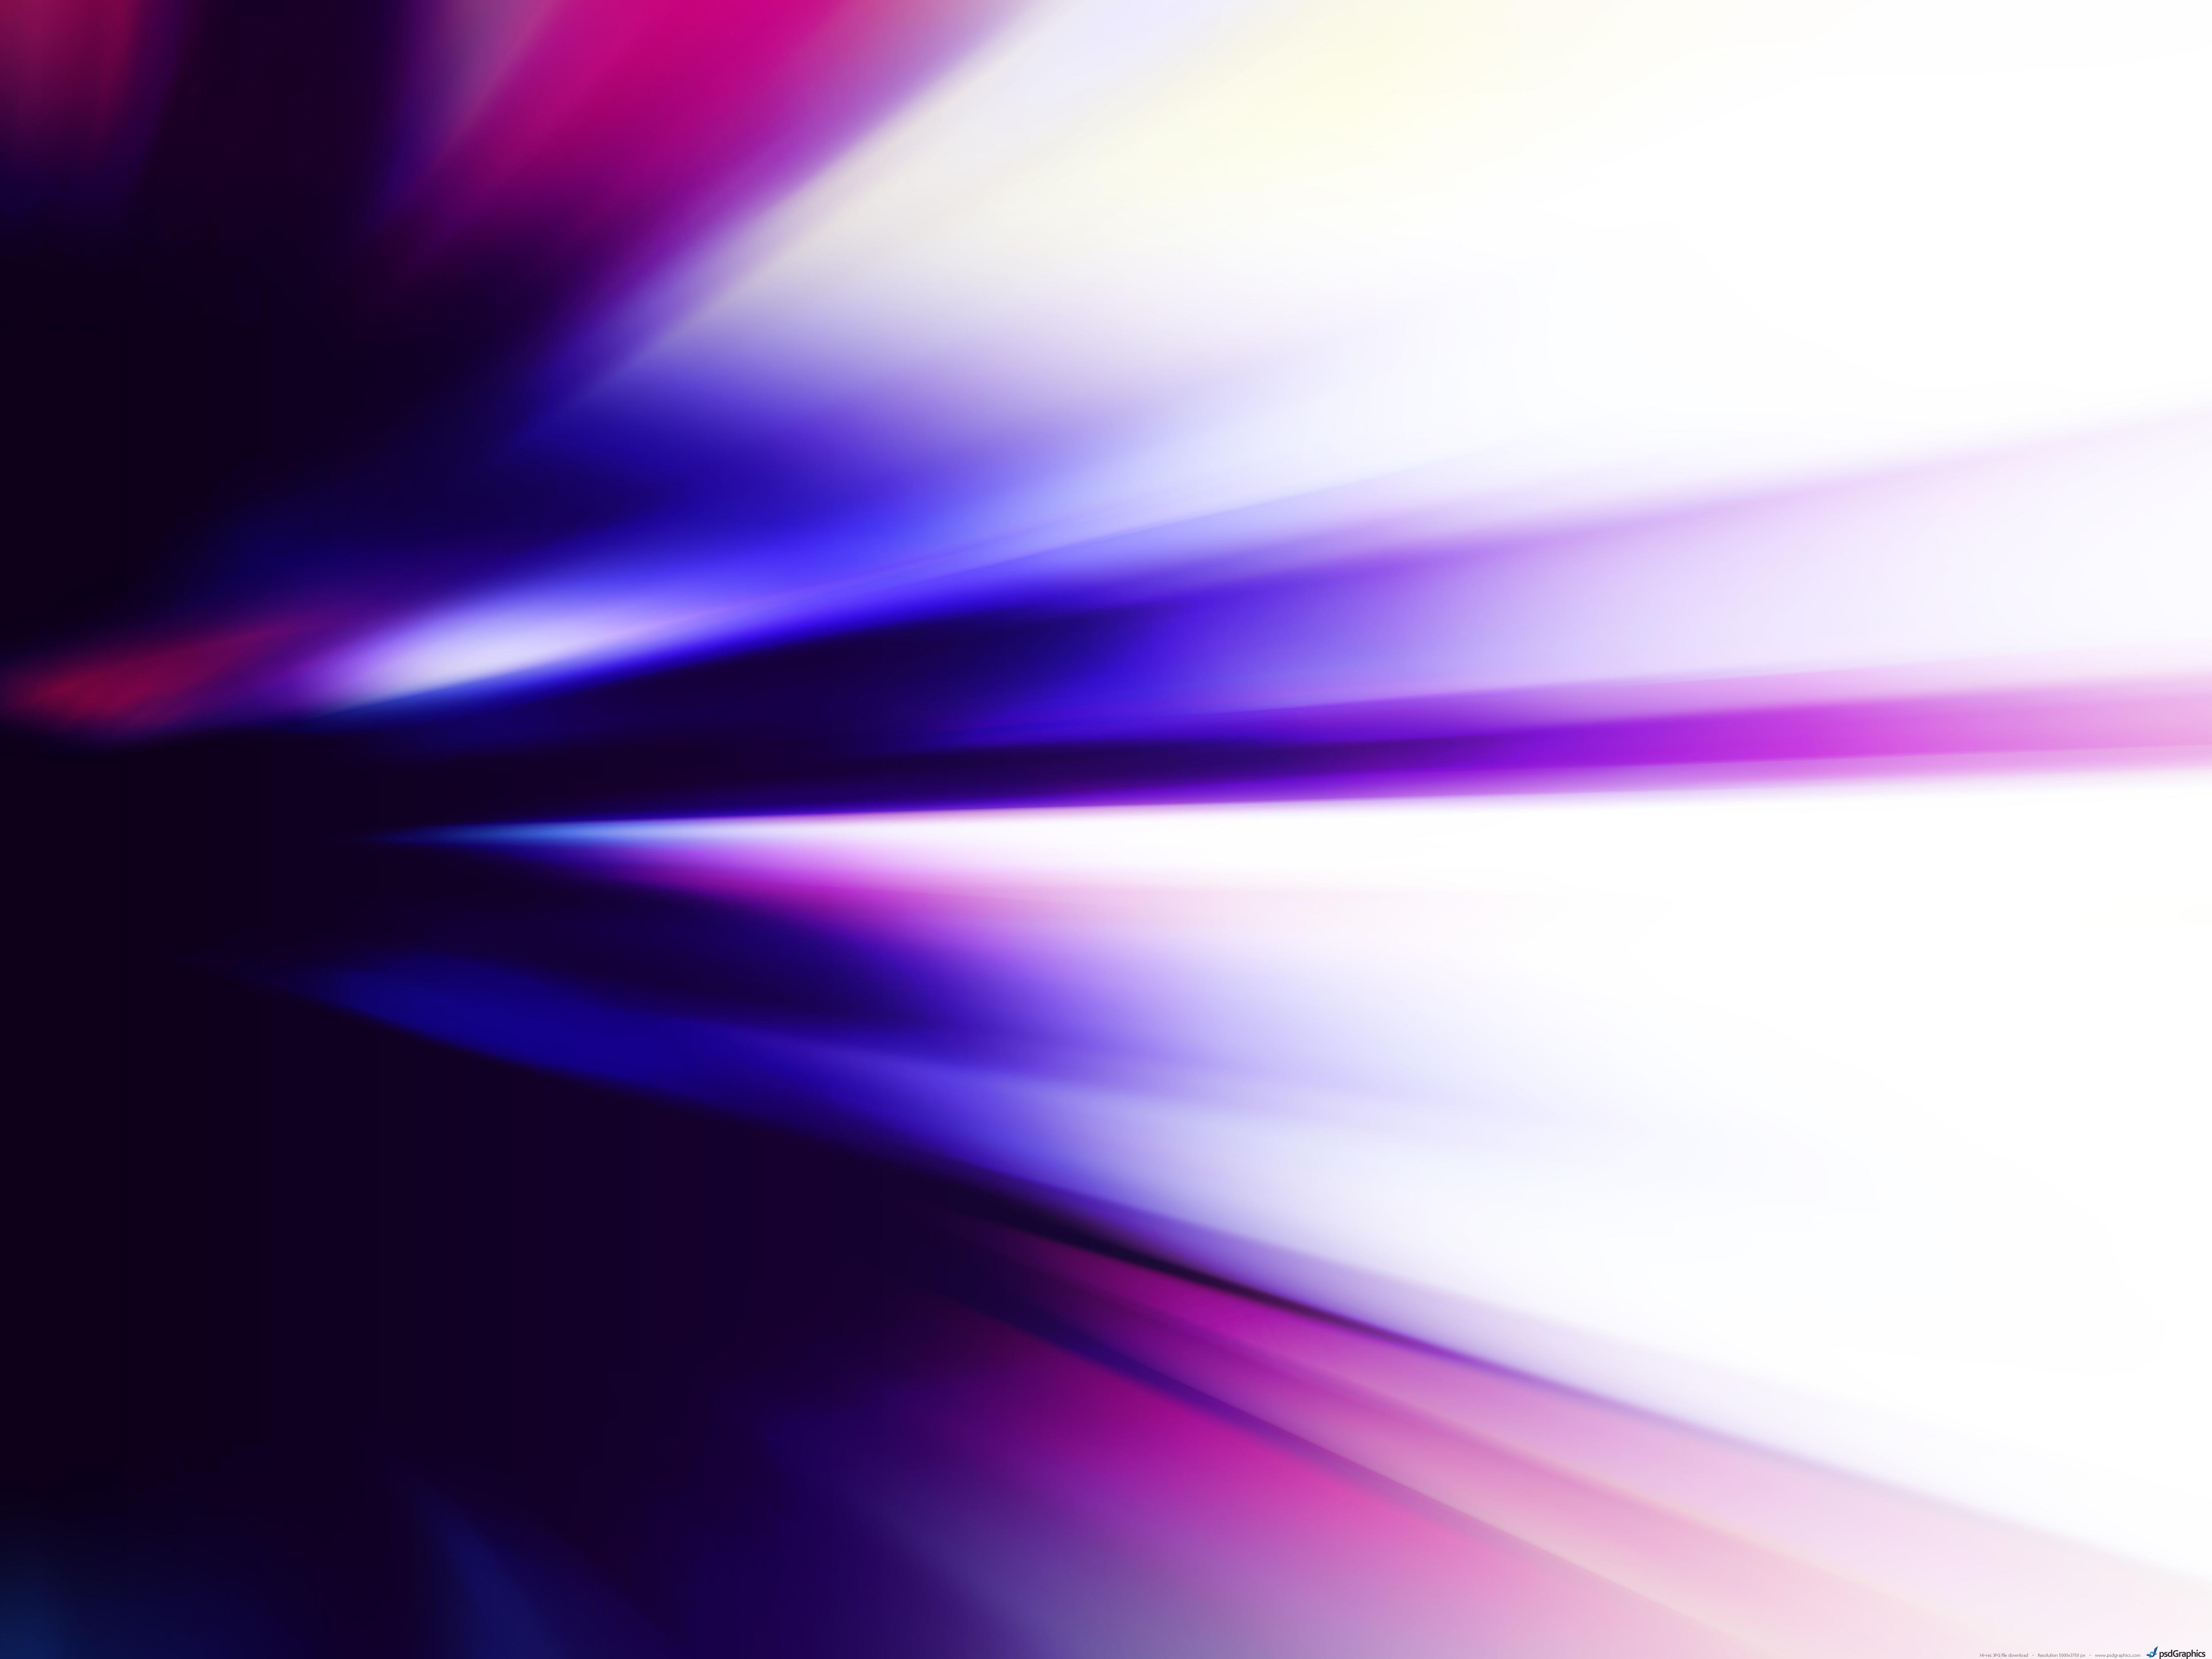 Purple motion blur photo